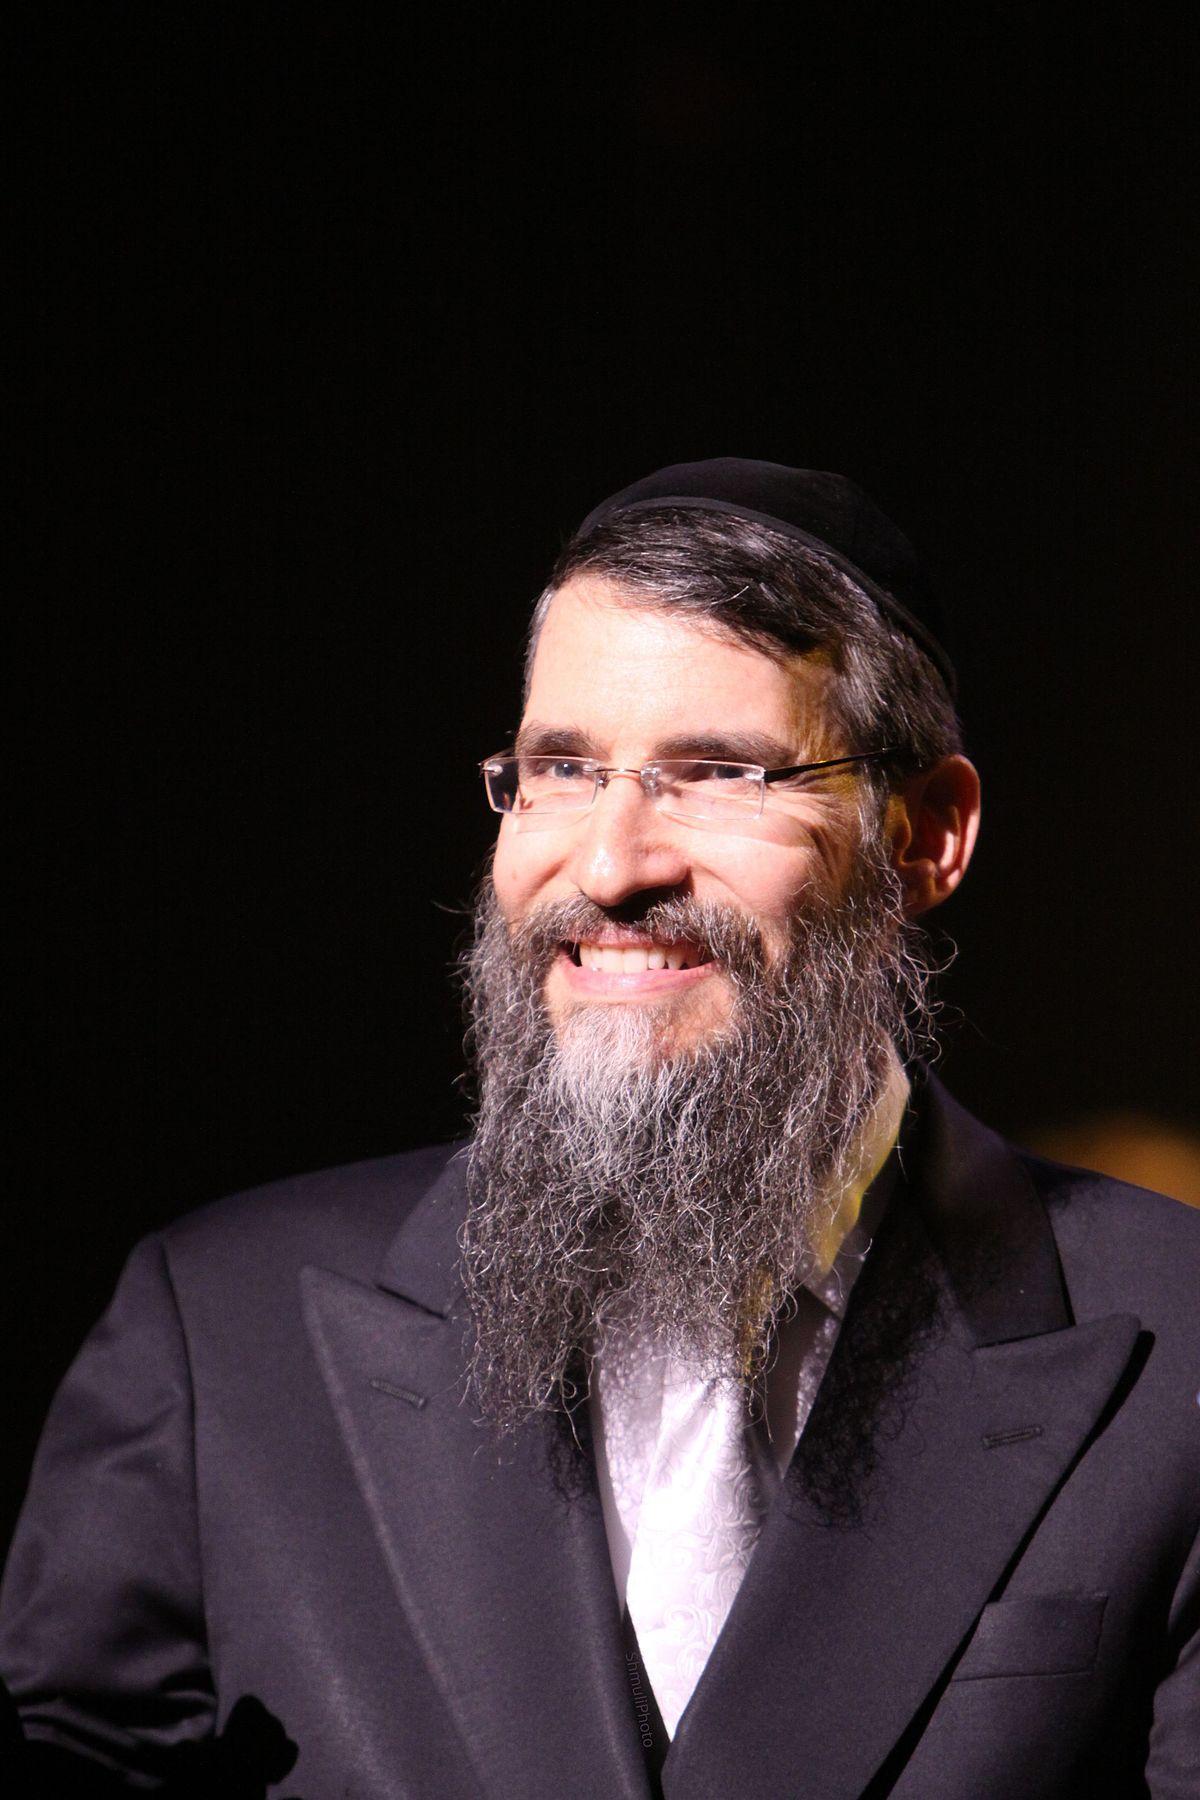 Rabbi Friedman In Kew Gardens Hills: Avraham Fried